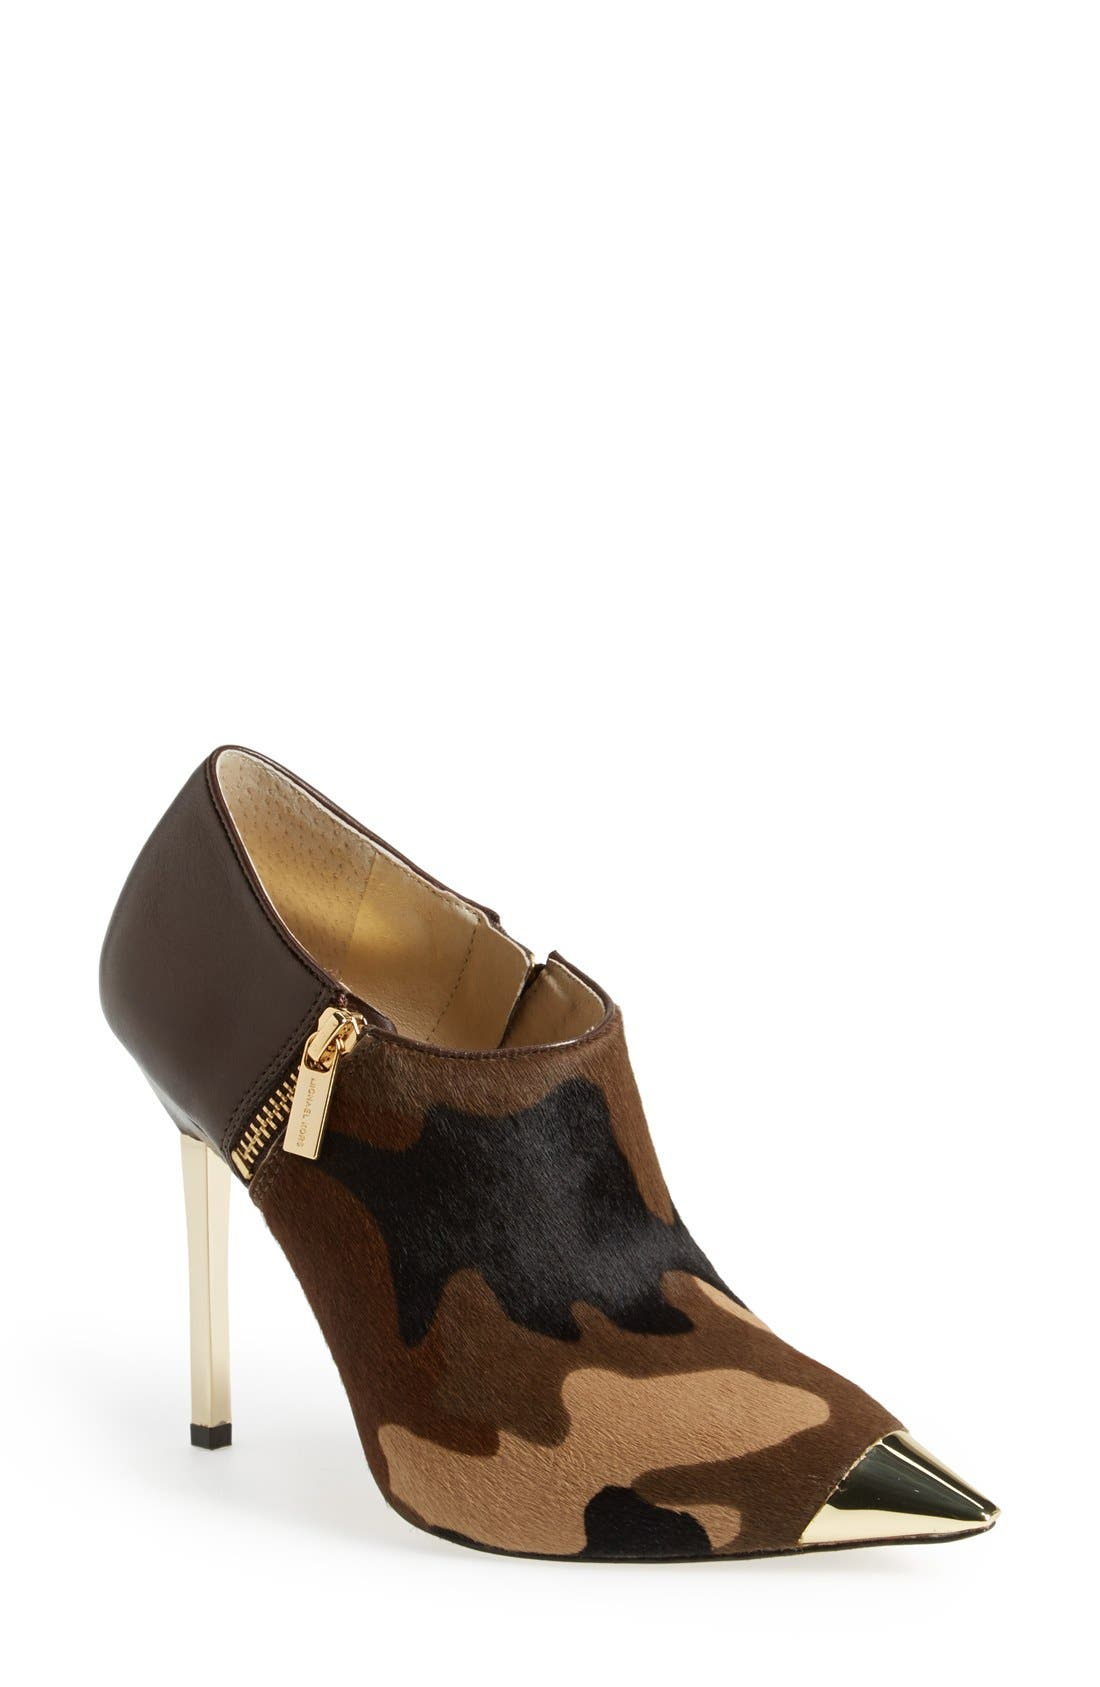 Main Image - MICHAEL Michael Kors 'Zady' Pointy Toe Bootie (Women)